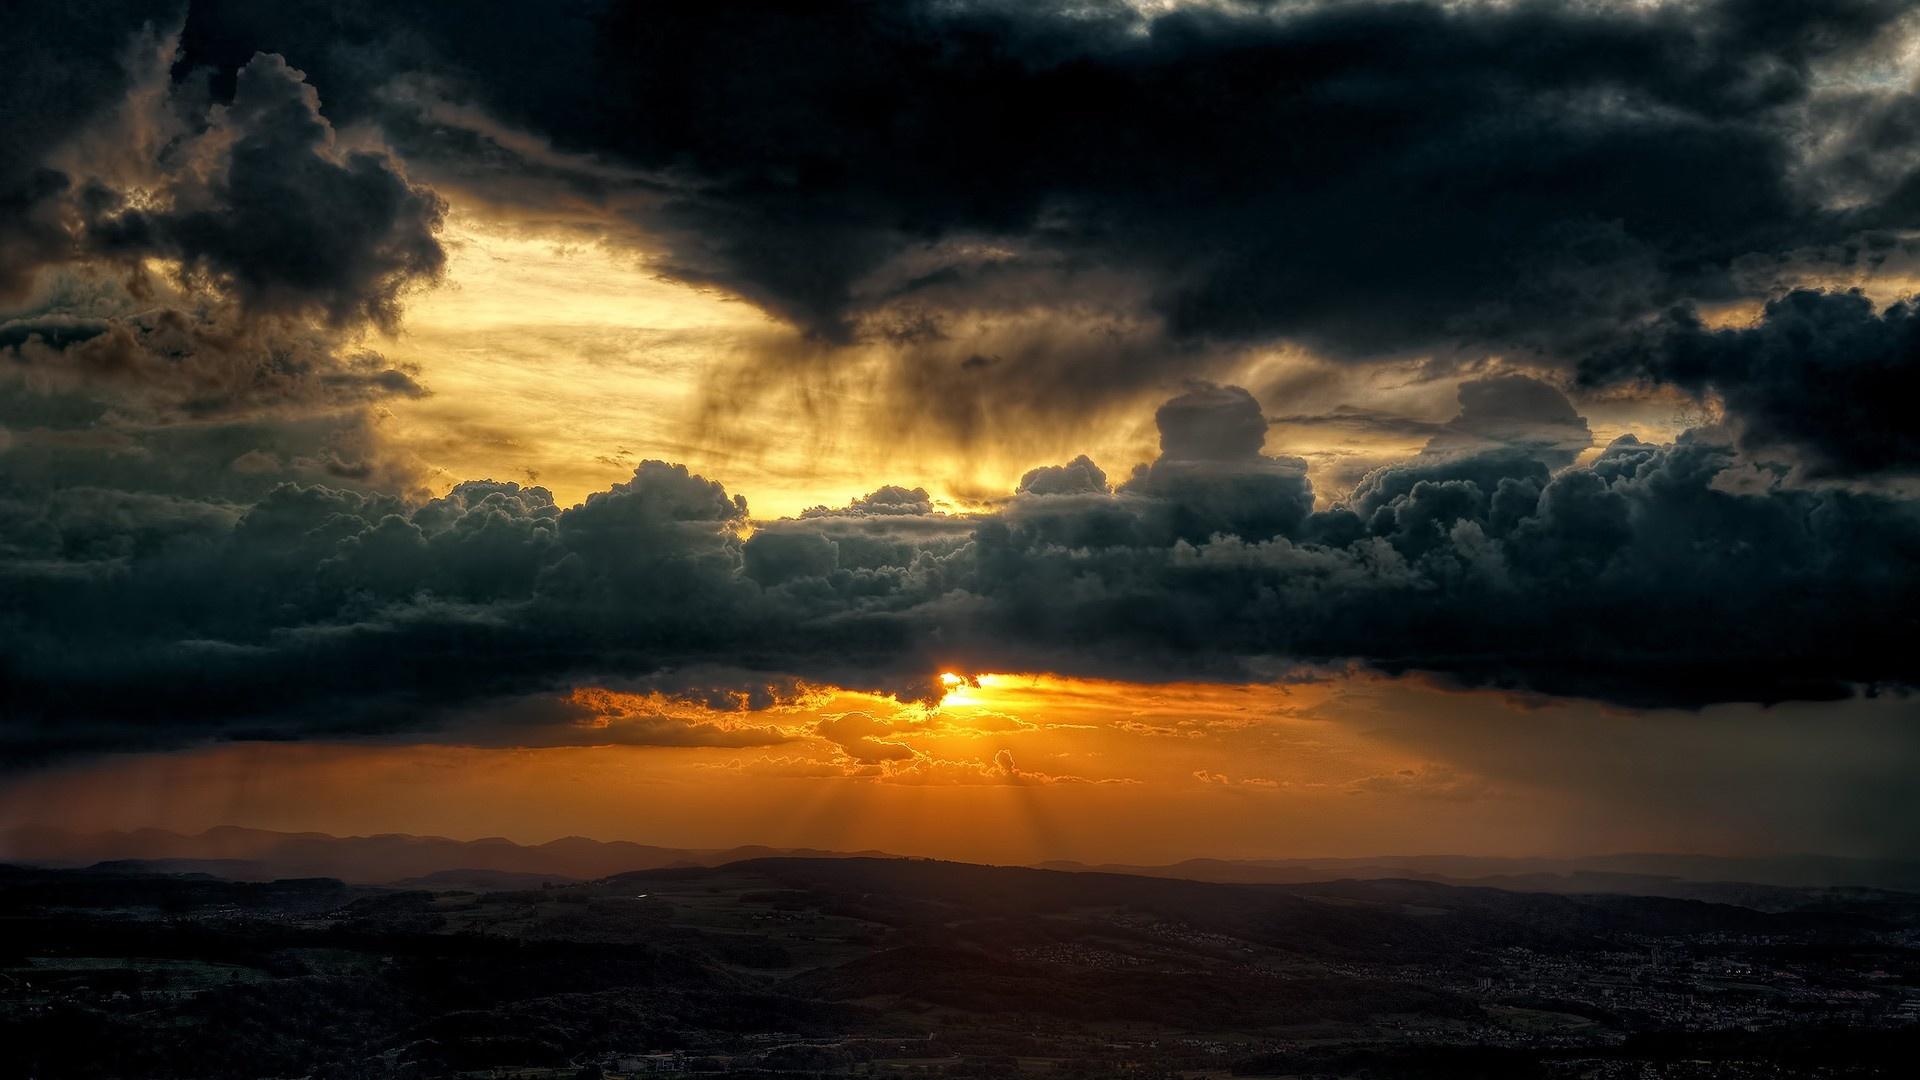 Dark Clouds Sky Sun Wallpapers - 1920x1080 - 396420